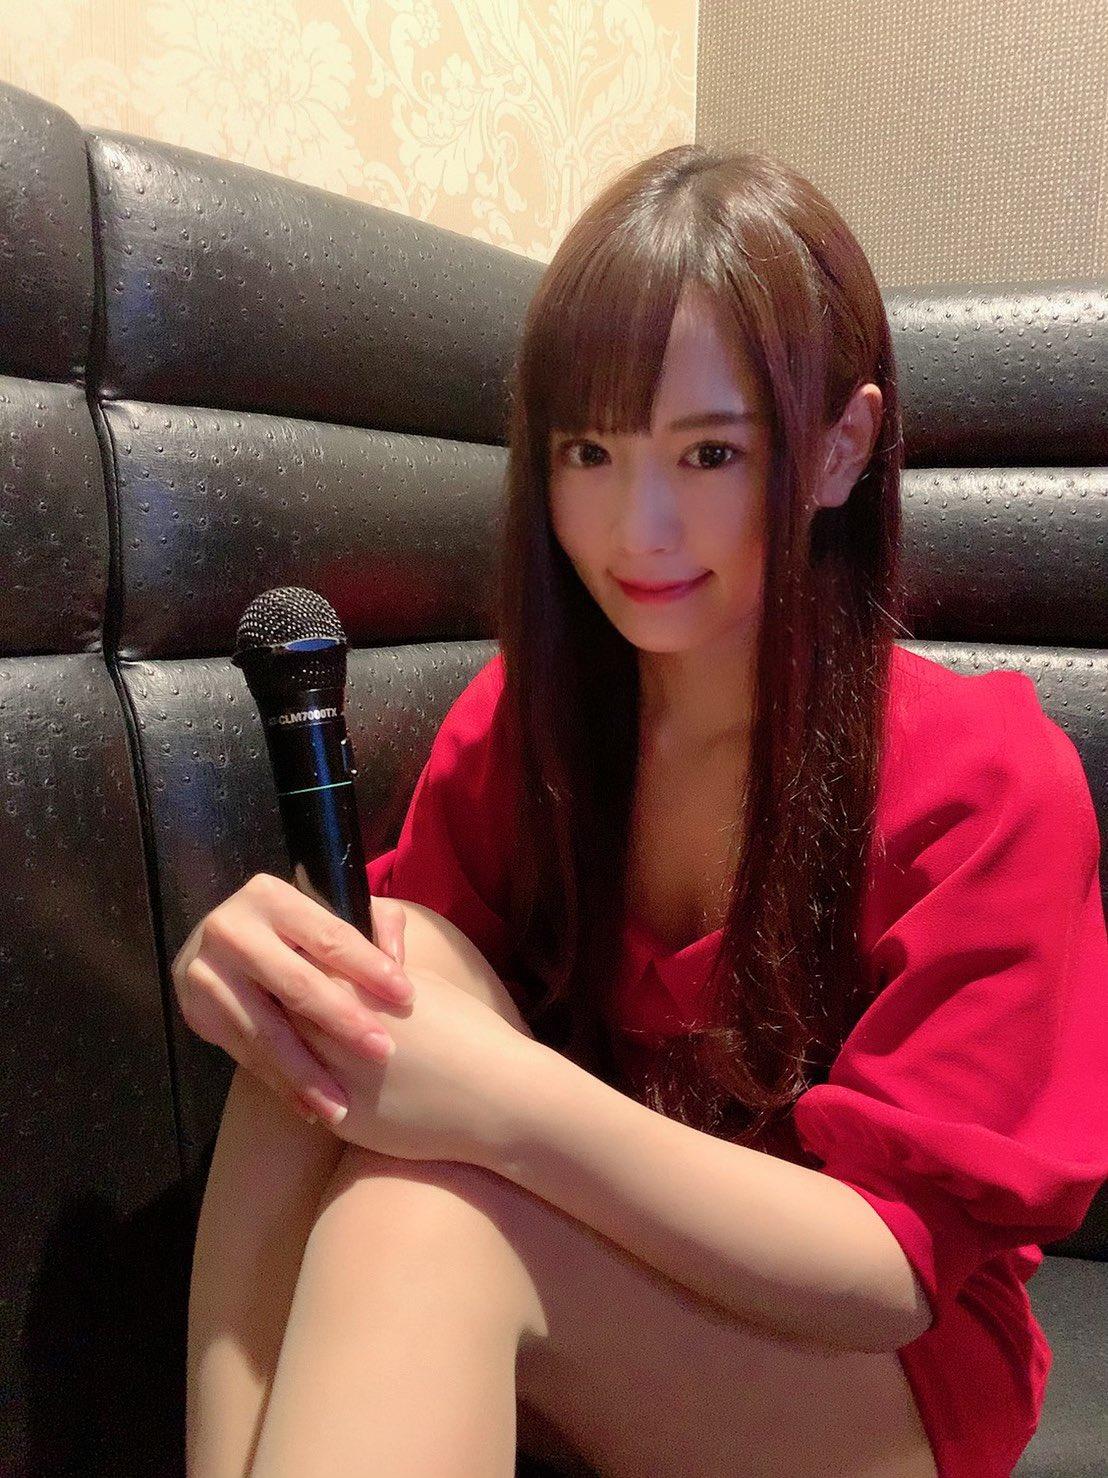 image http://scanlover.com/assets/images/11110-6AyZv6TTqr53NdtN.jpeg